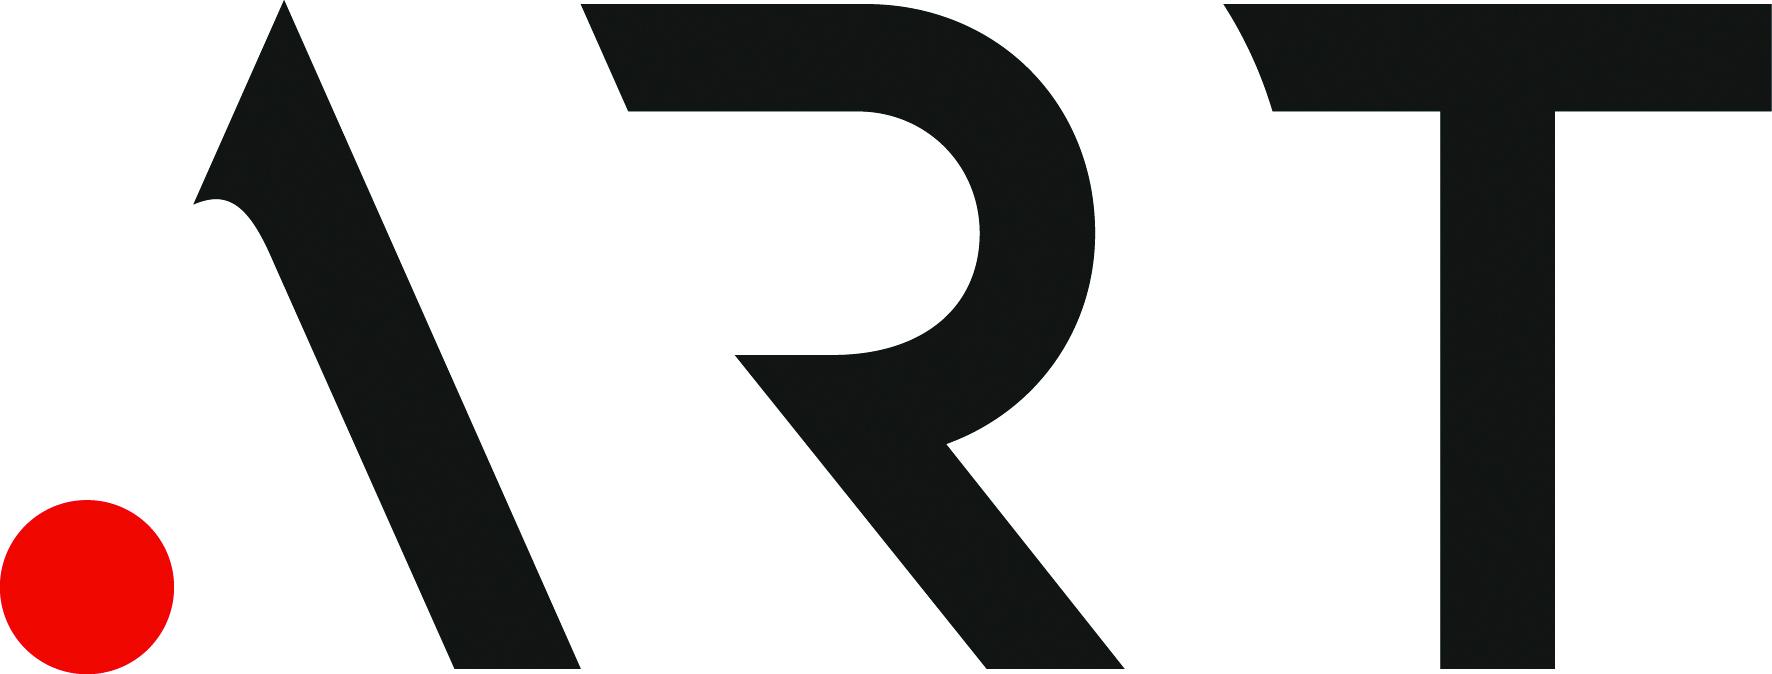 .ART TLD logo